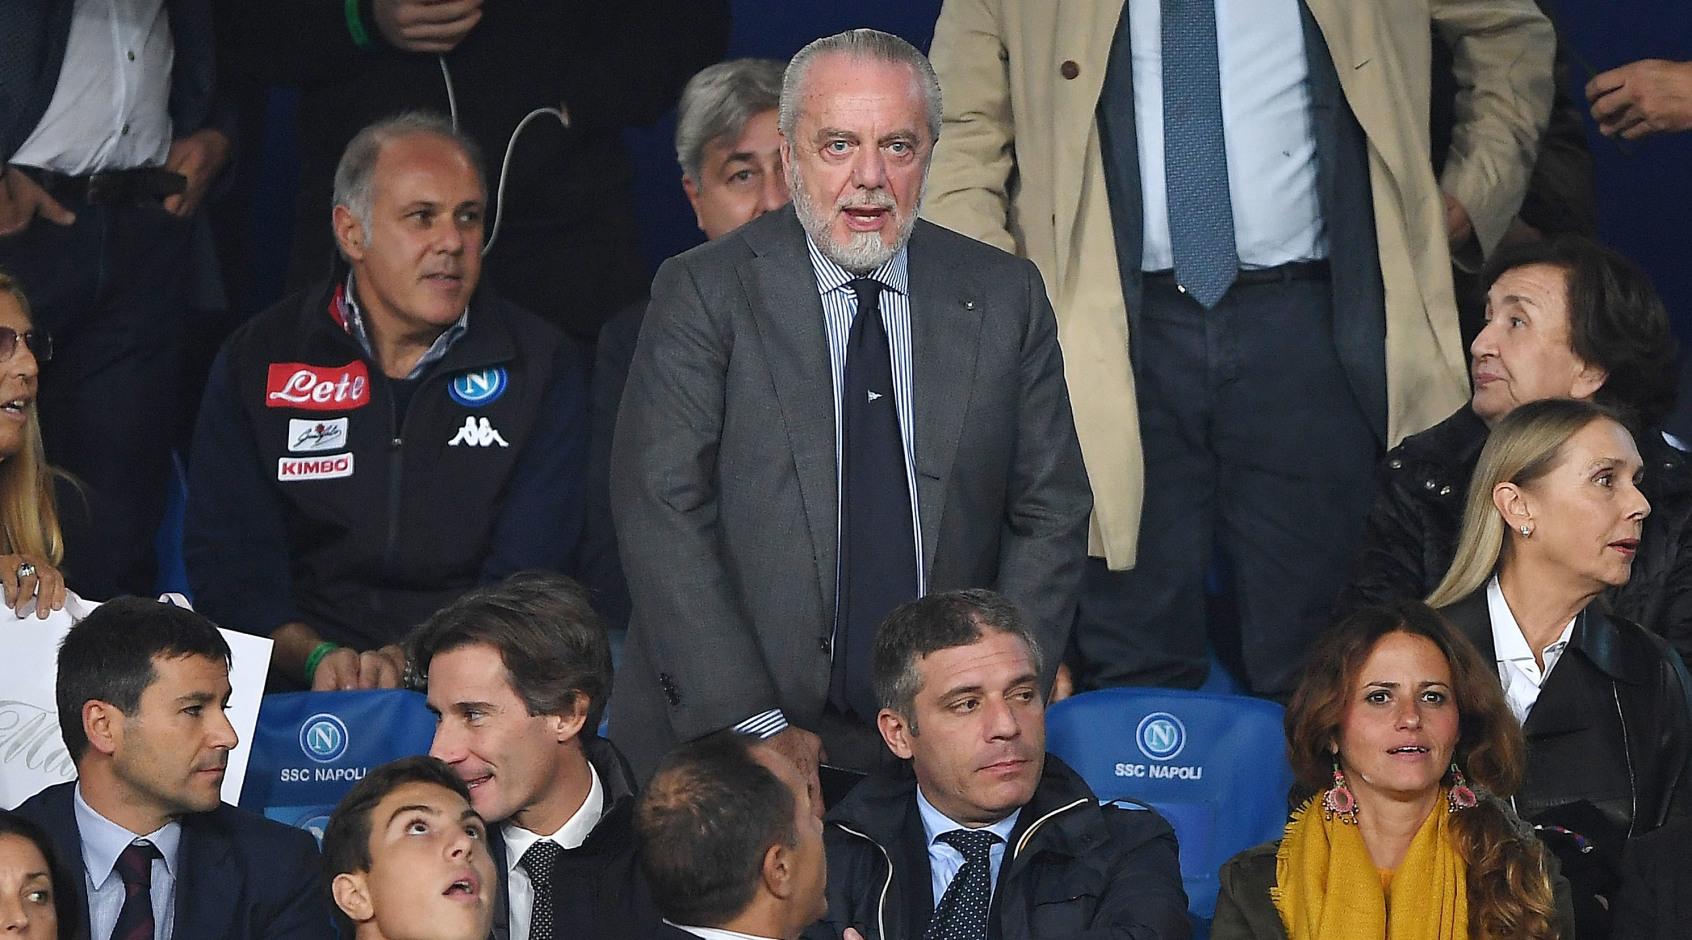 La Gazzetta dello Sport: Аурелио Де Лаурентис хочет уволить Гаттузо и вернуть Анчелотти